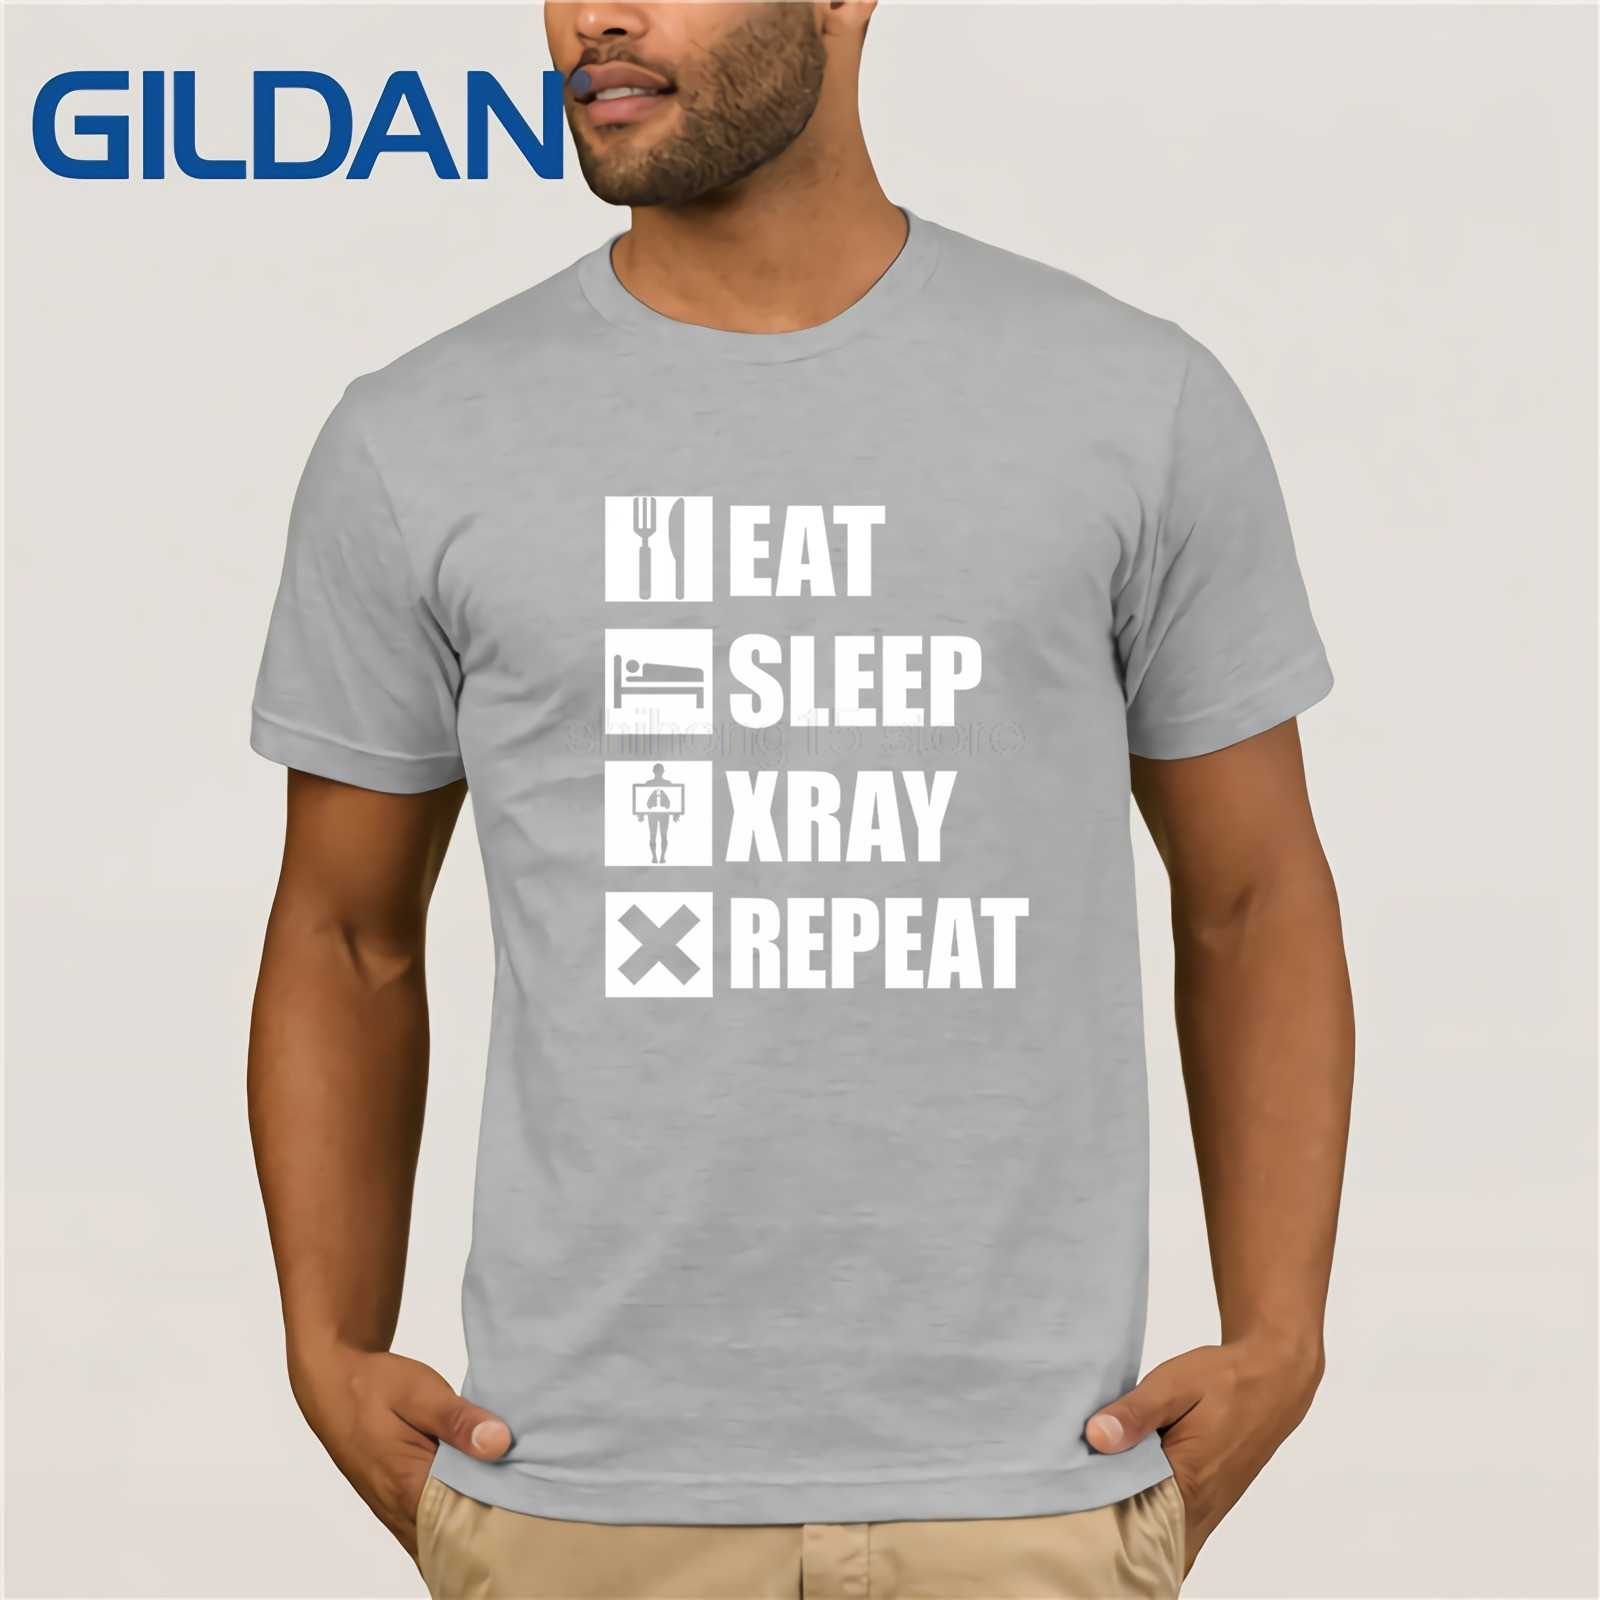 a51a4b7f9 ... EAT SLEEP XRAY SHIRT, Funny RT Radiology X-Ray Tech T Shirt Sleeve Tops  ...